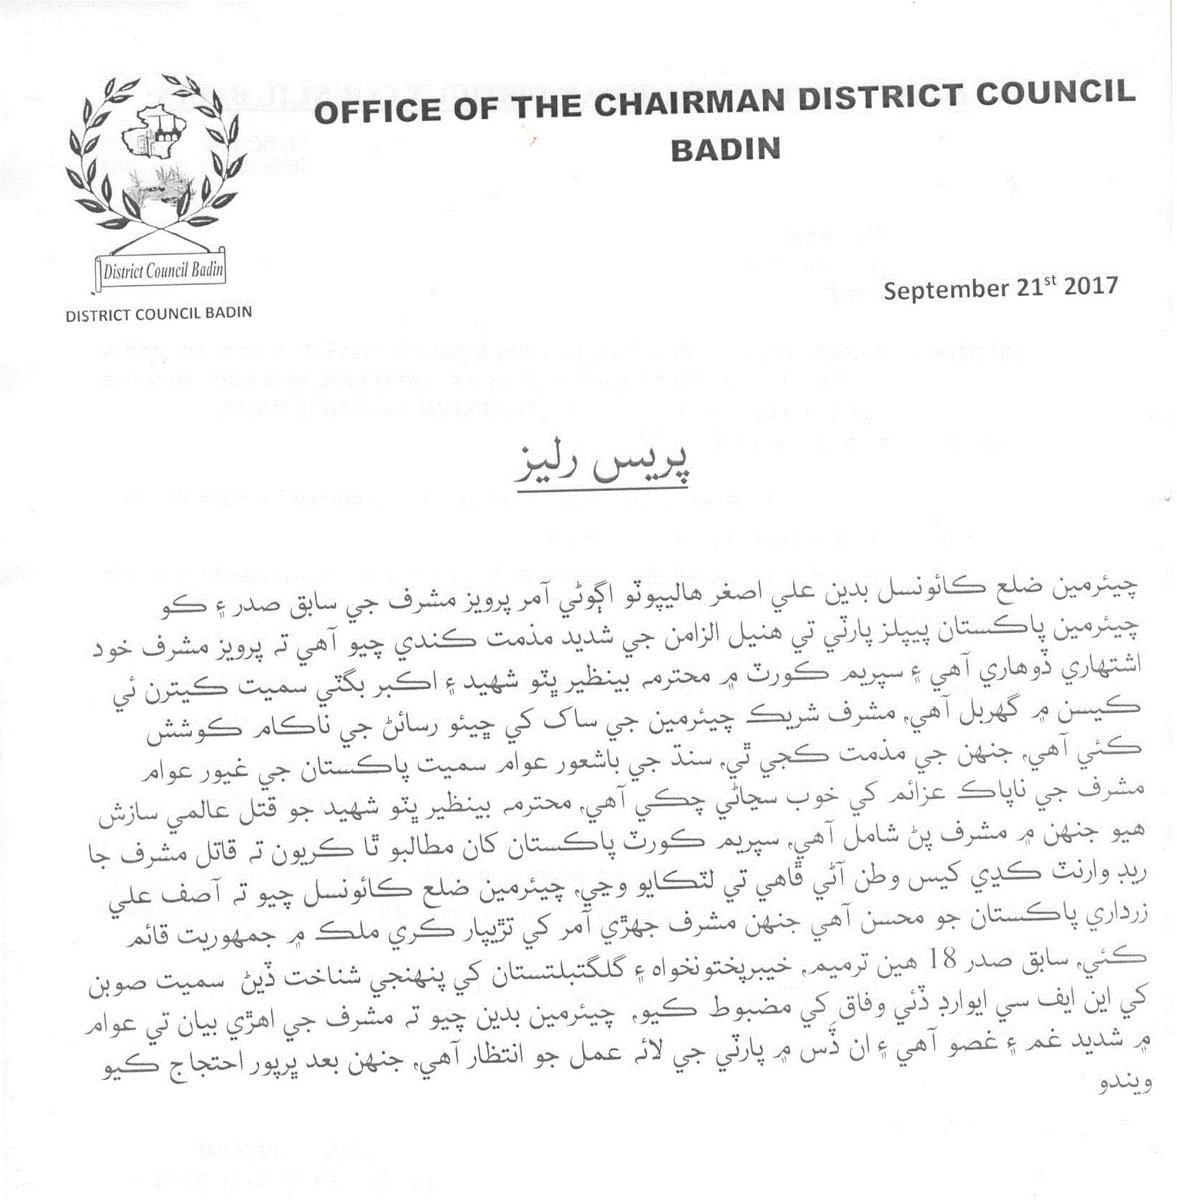 #ChairmanBadin @AAsgharHalepoto condemn Musharraf&#39;s statement against Zardari sb and involving him murder of #SMBB #PressRelease <br>http://pic.twitter.com/ElIYOtwFON